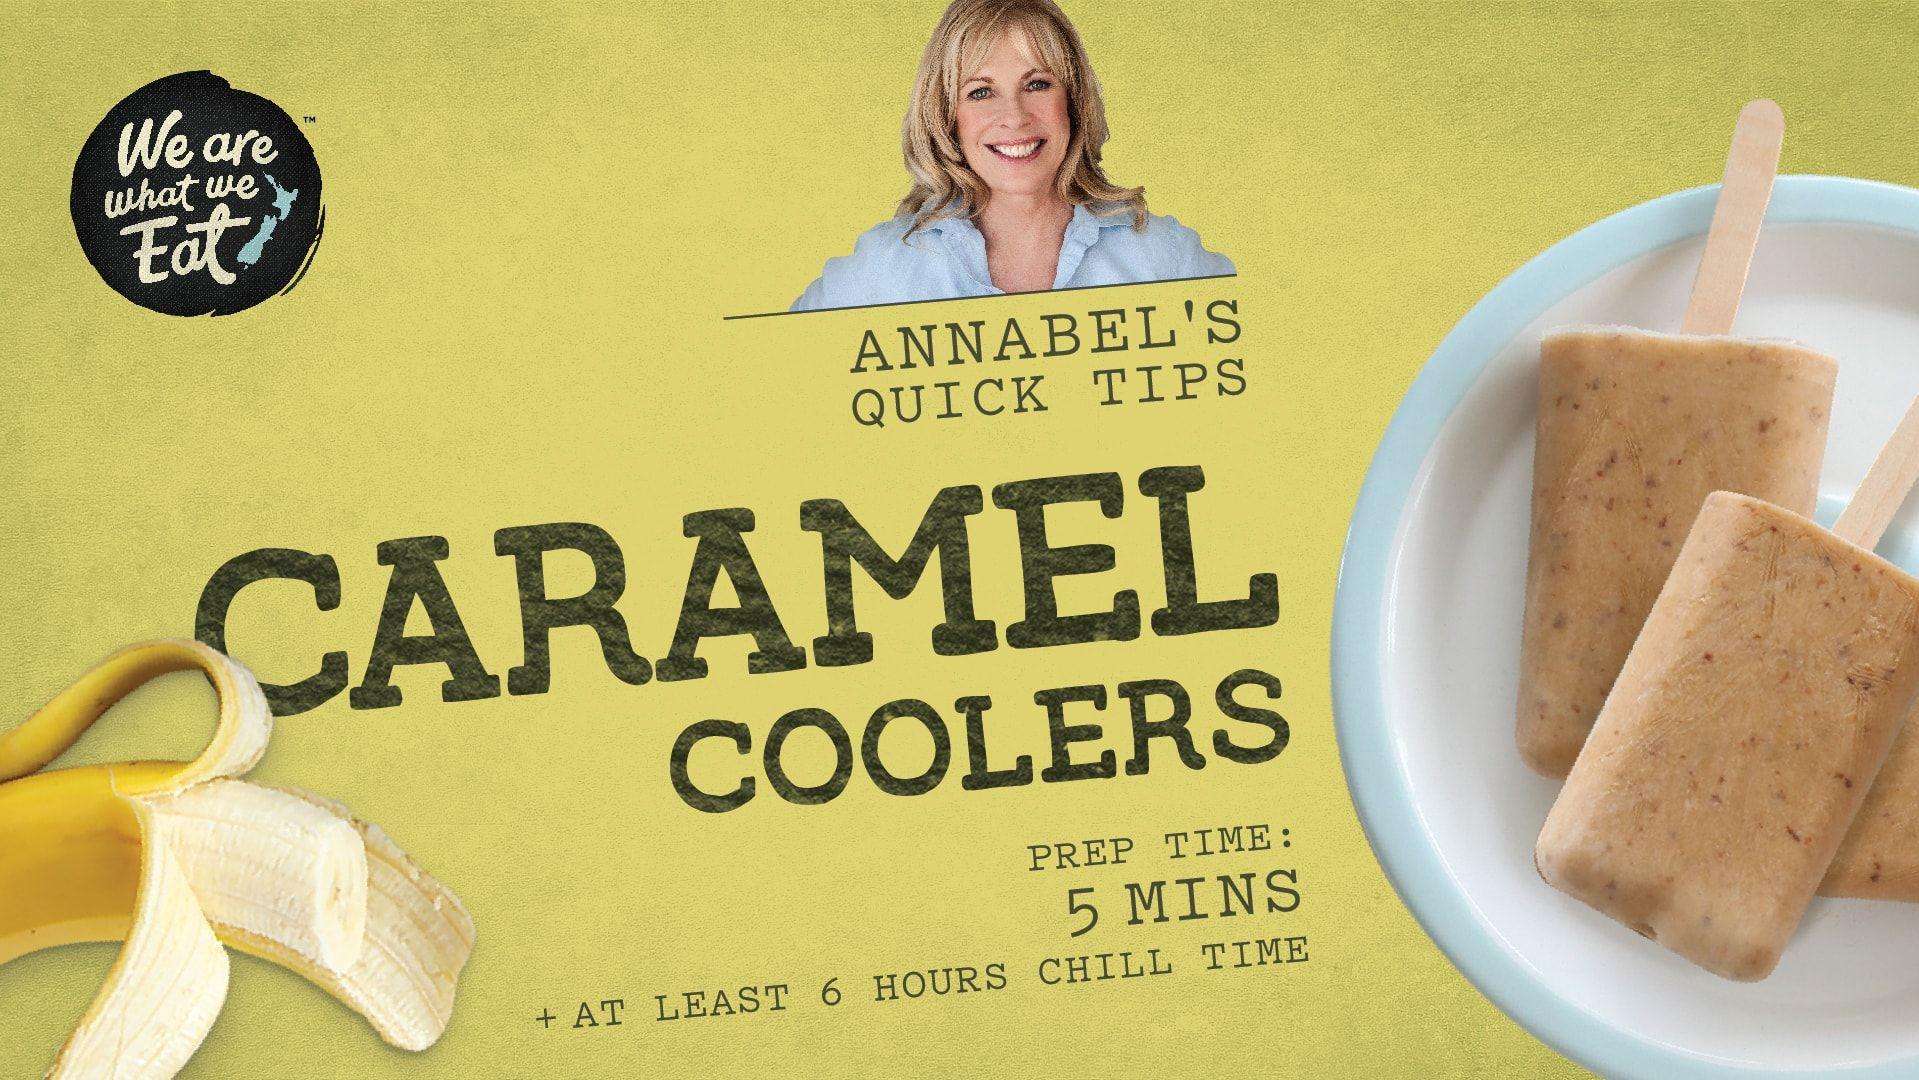 Caramel coolers summer snacks recipes caramel